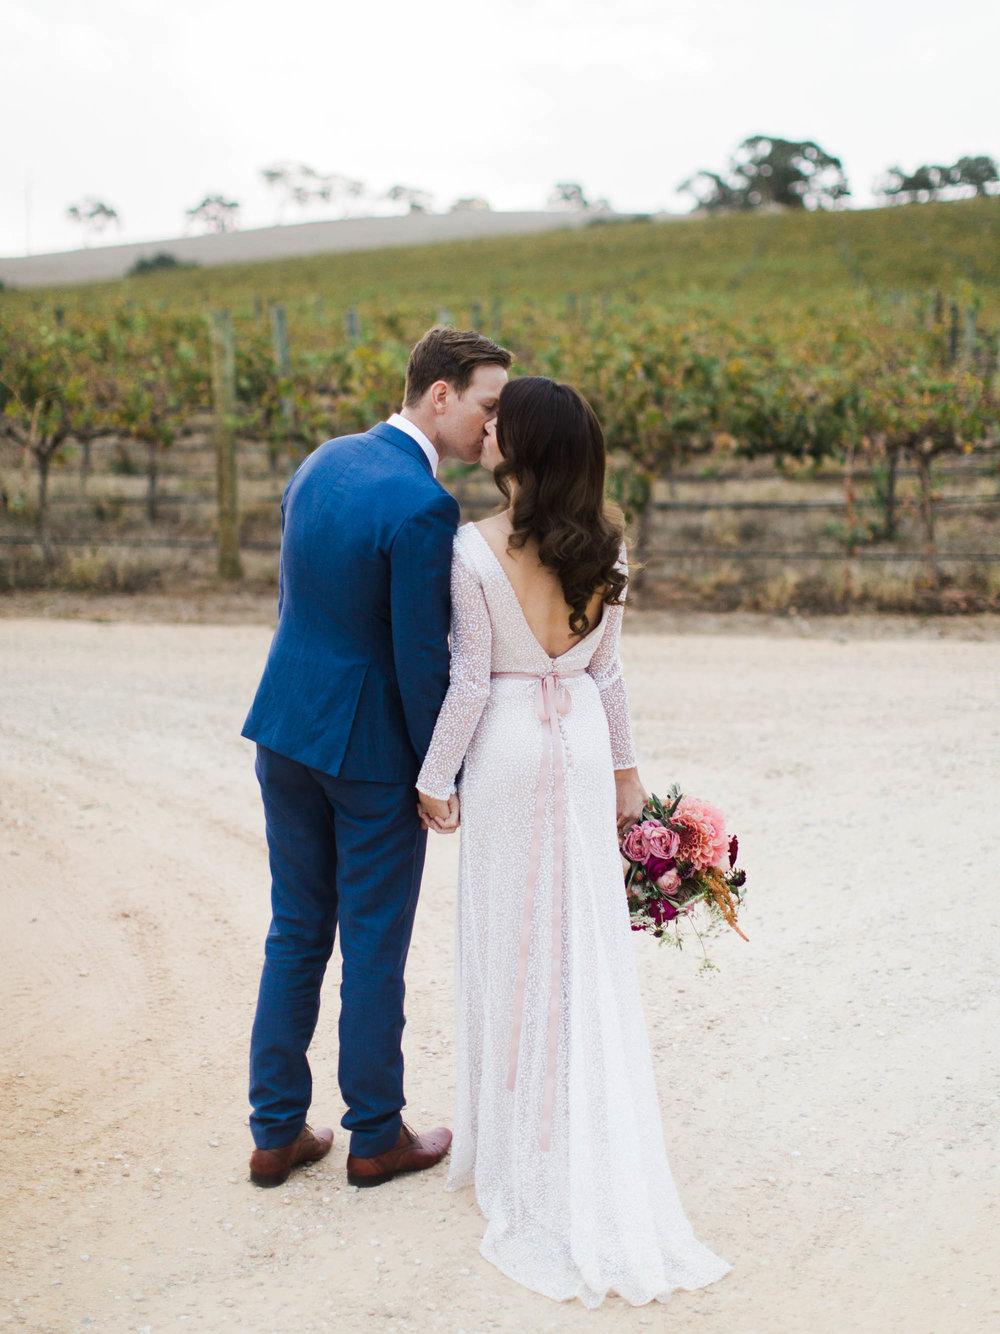 Hentley-Farm-wedding-photography-048.jpg